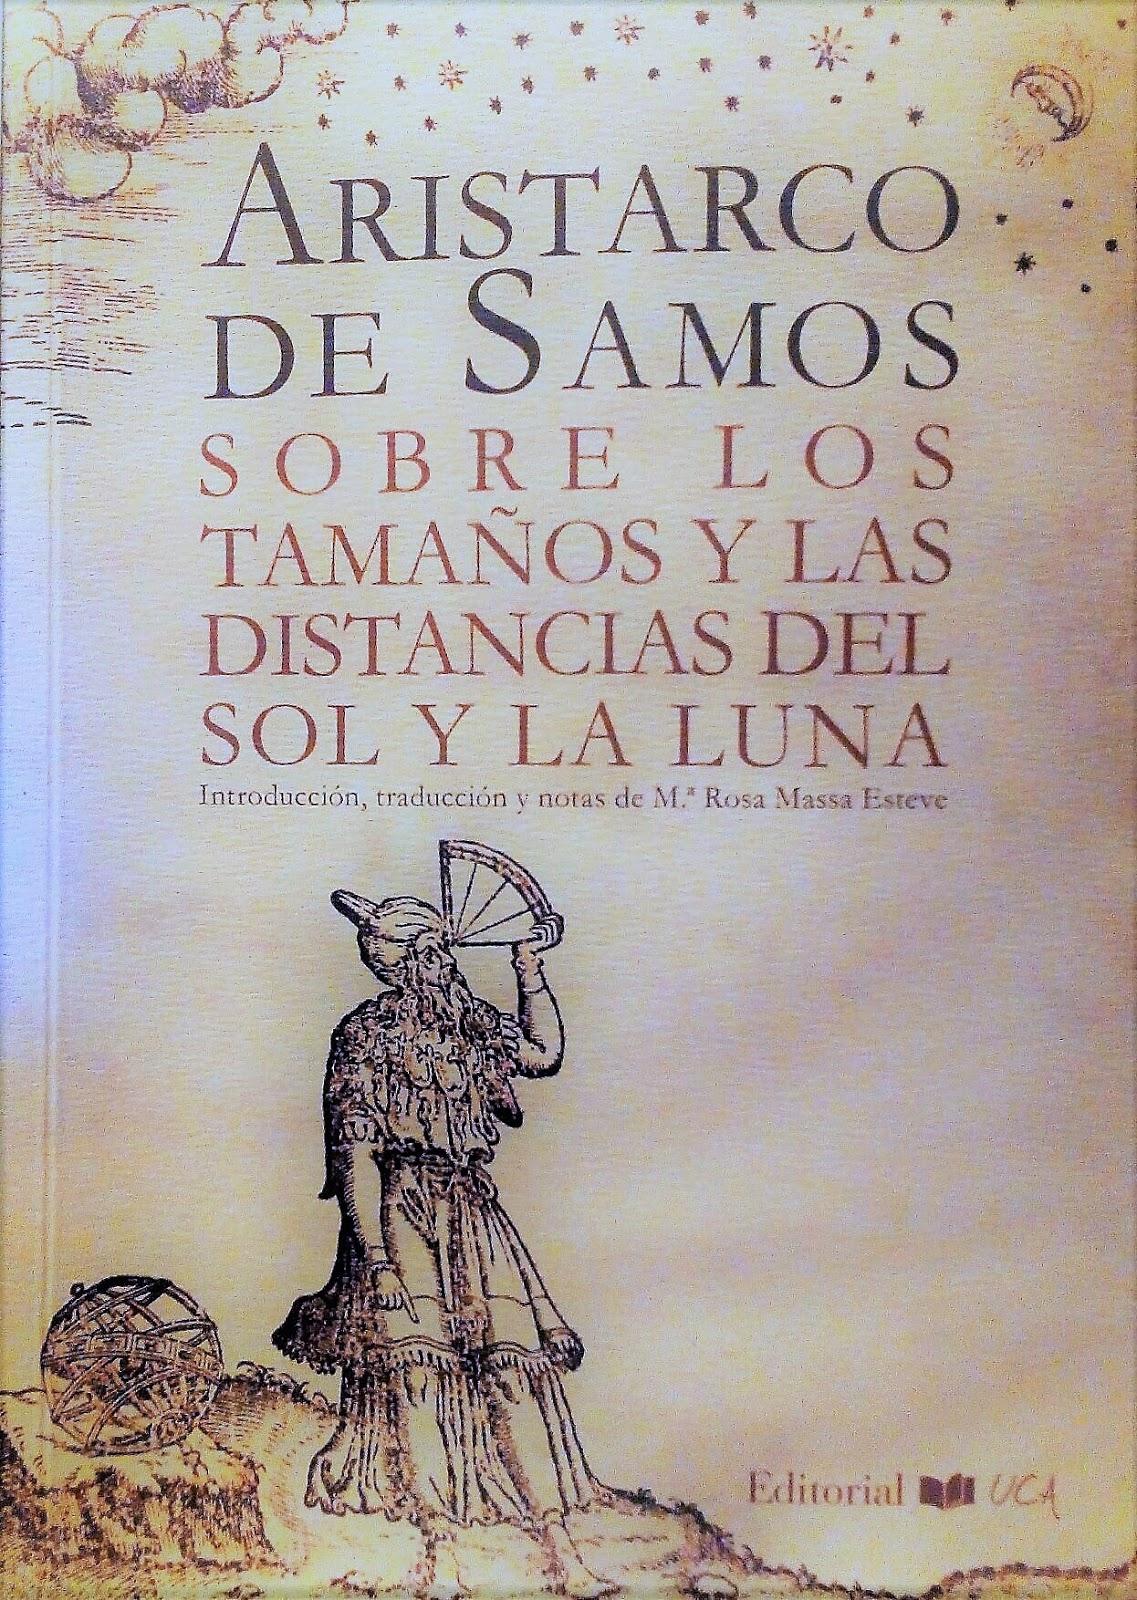 Profesora de castellano - 3 part 6